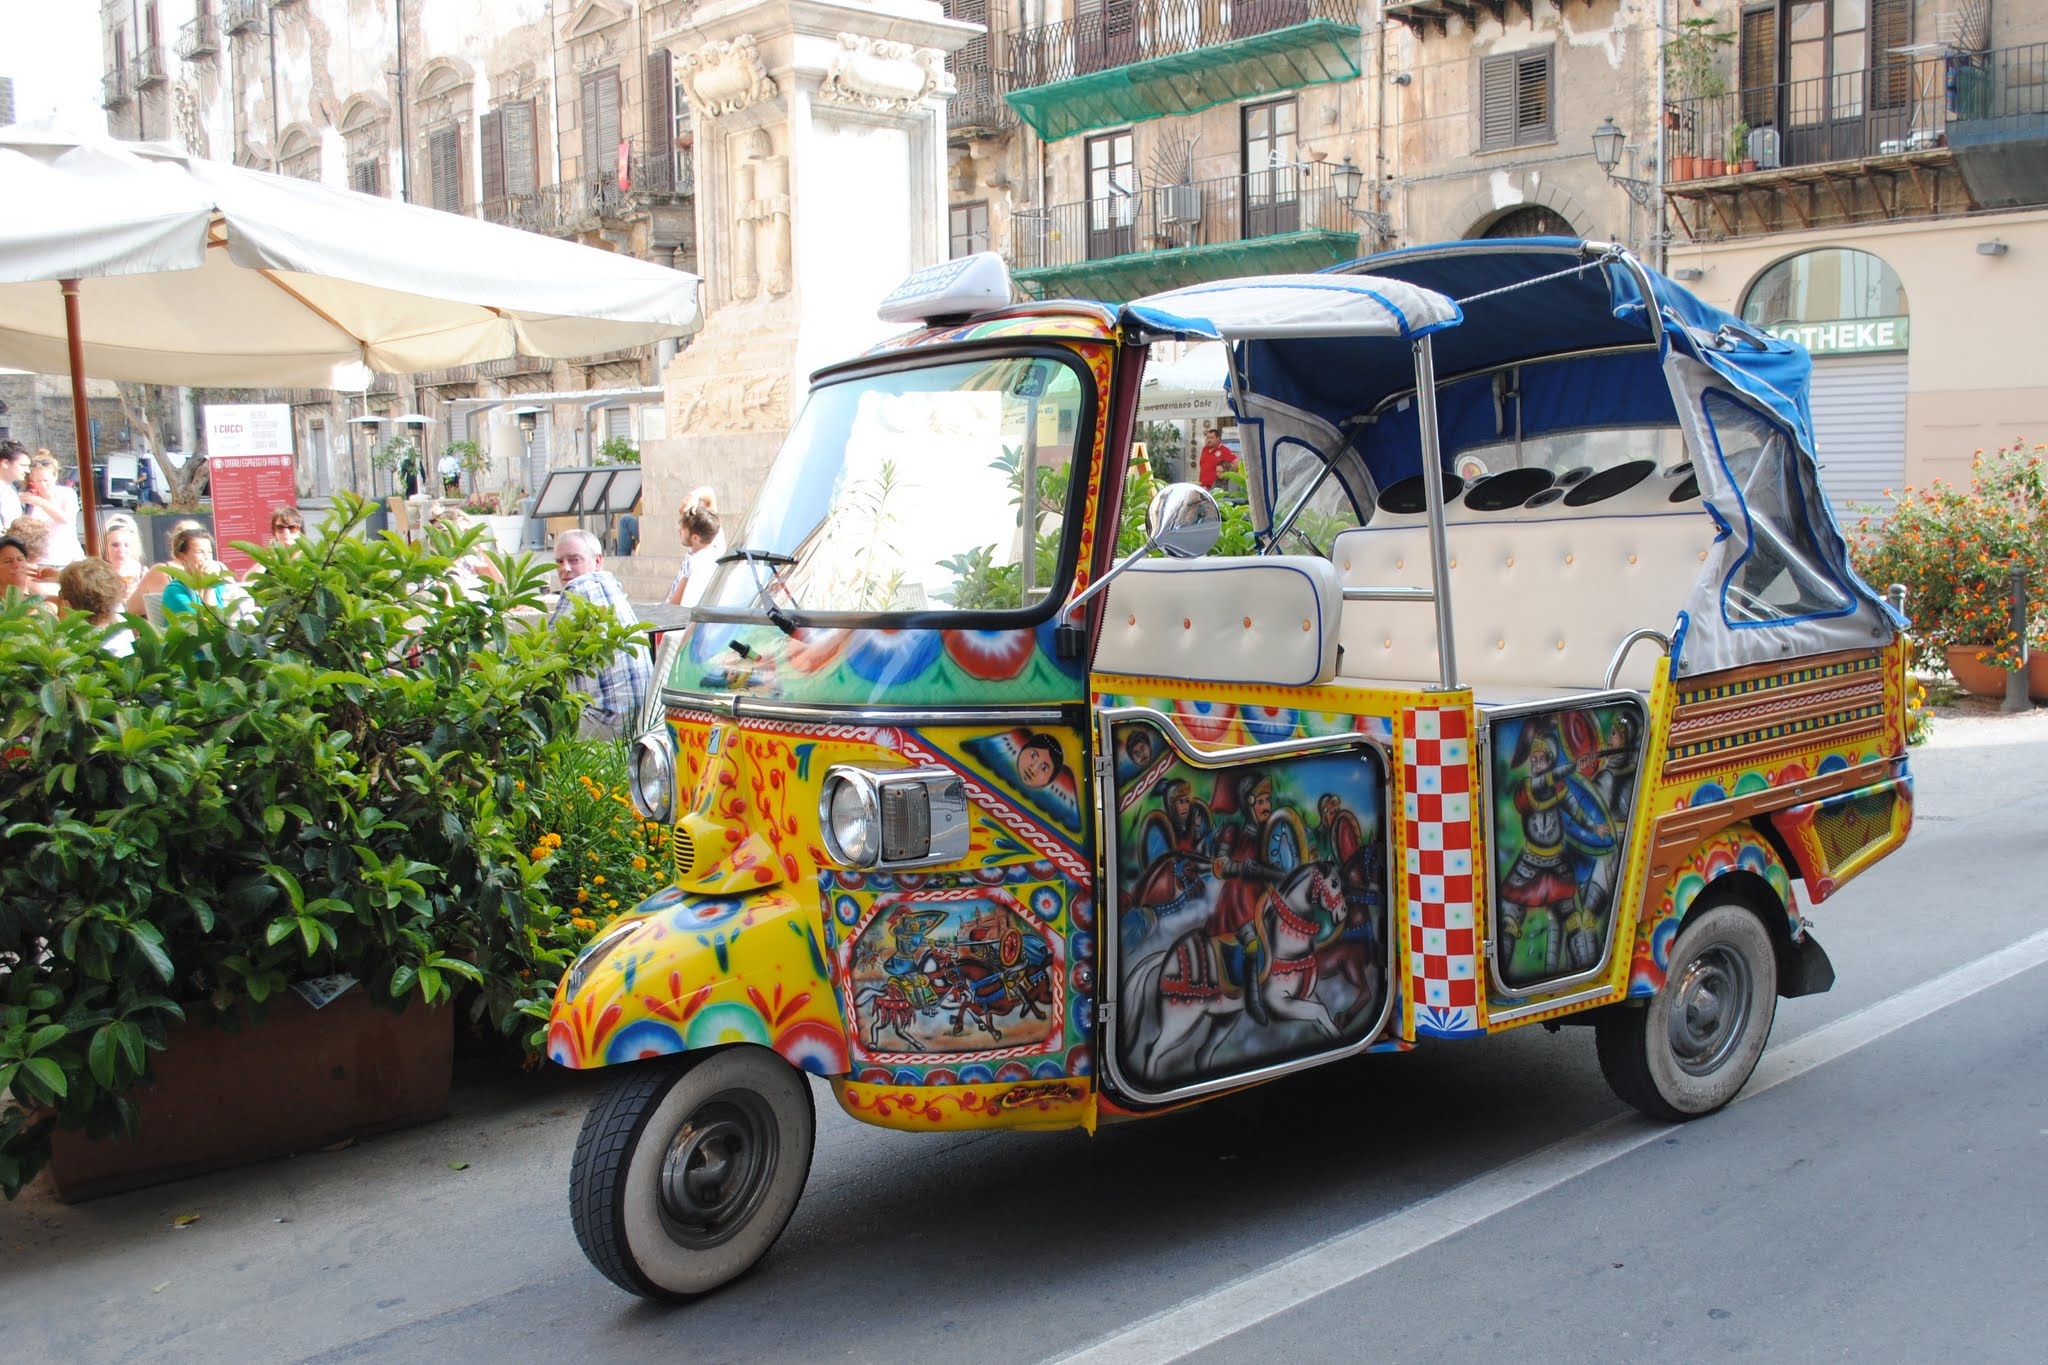 My Photos: Italy -- Sicily -- Palermo -- Walking Around the City